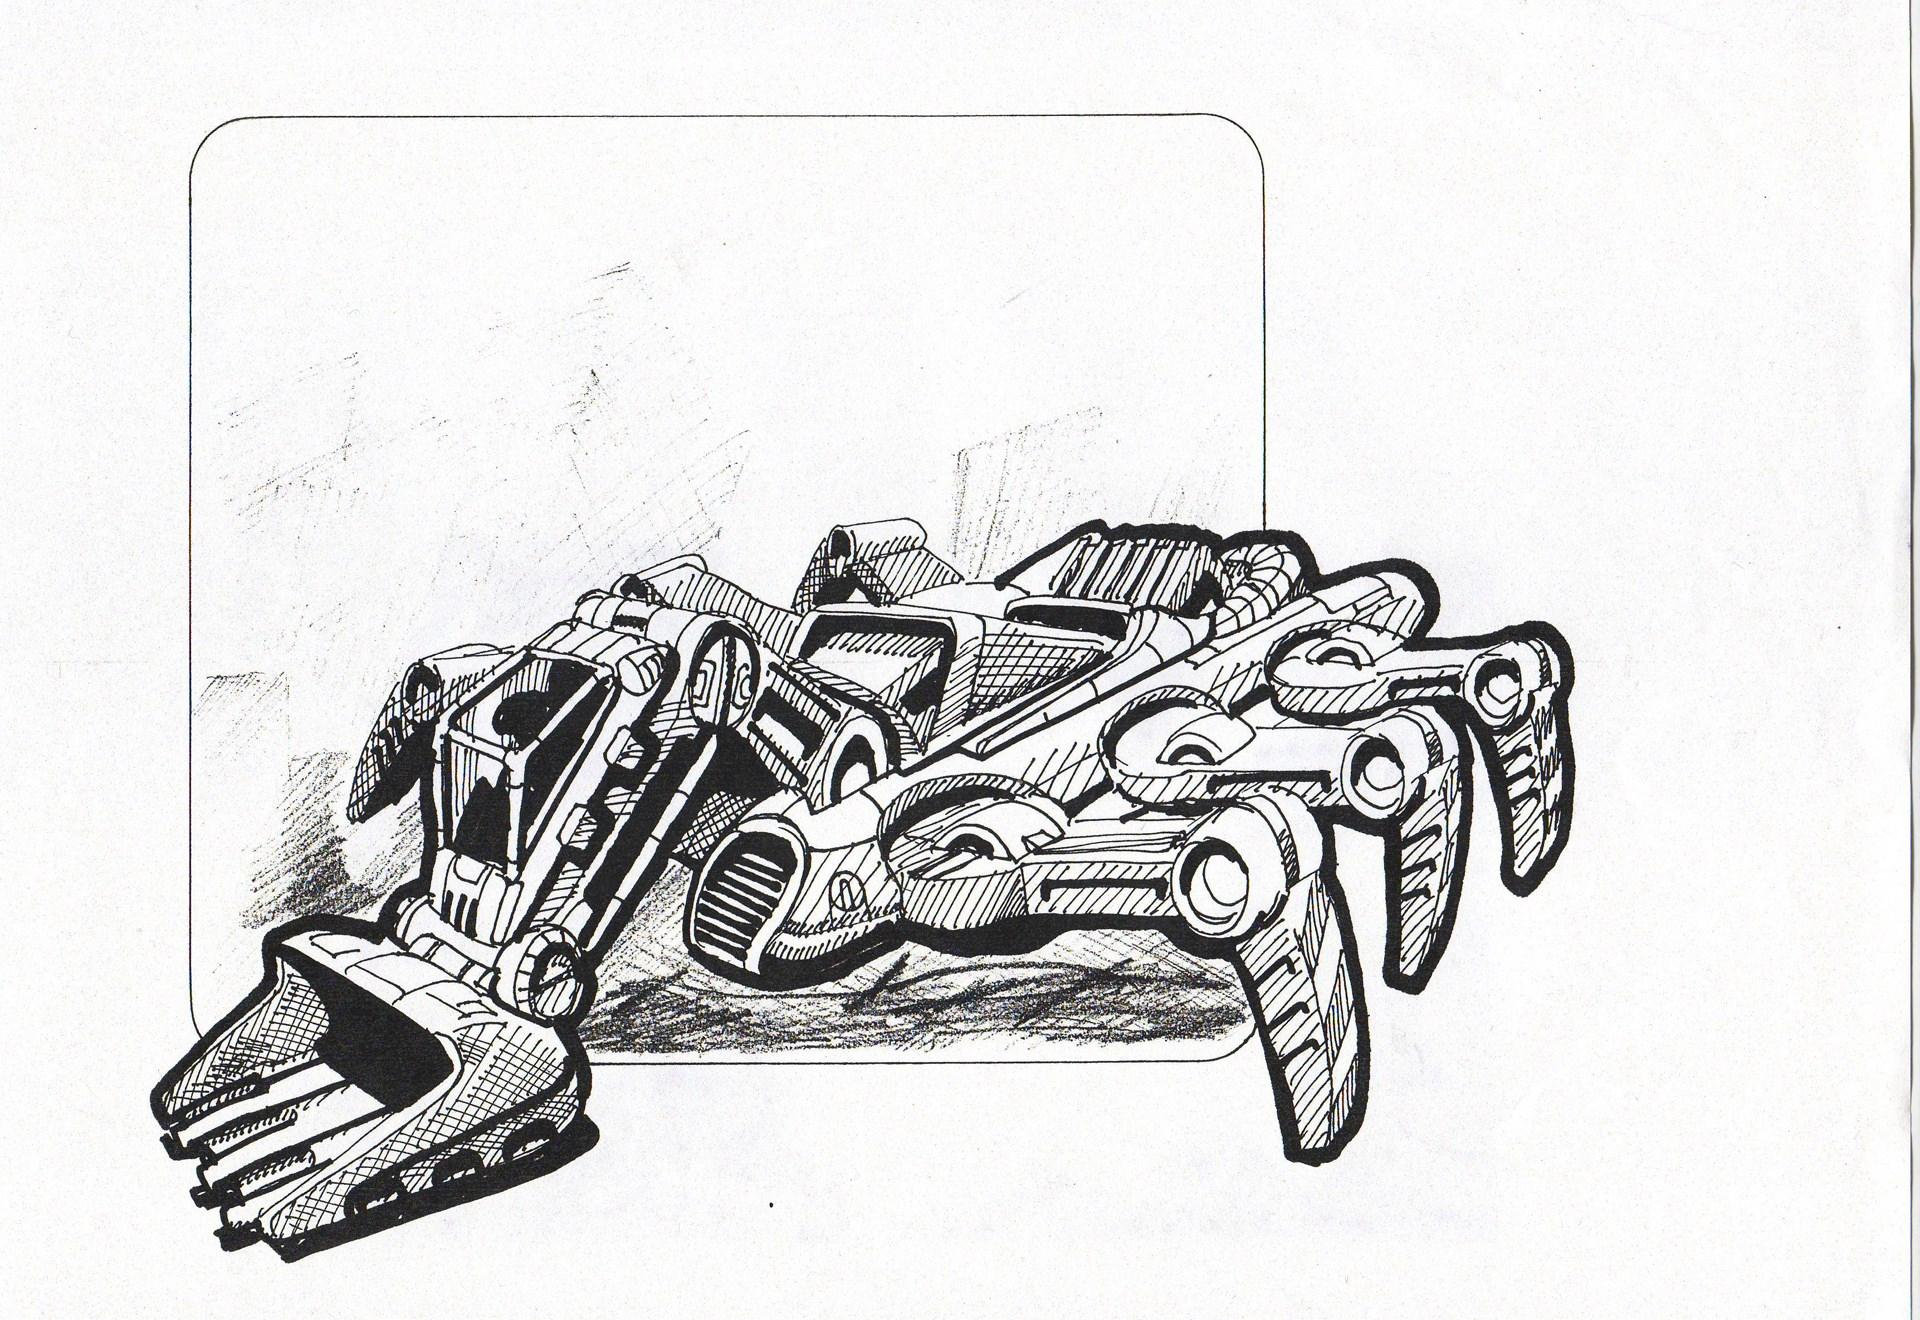 Blast Corps Concept Art Rarefandabase